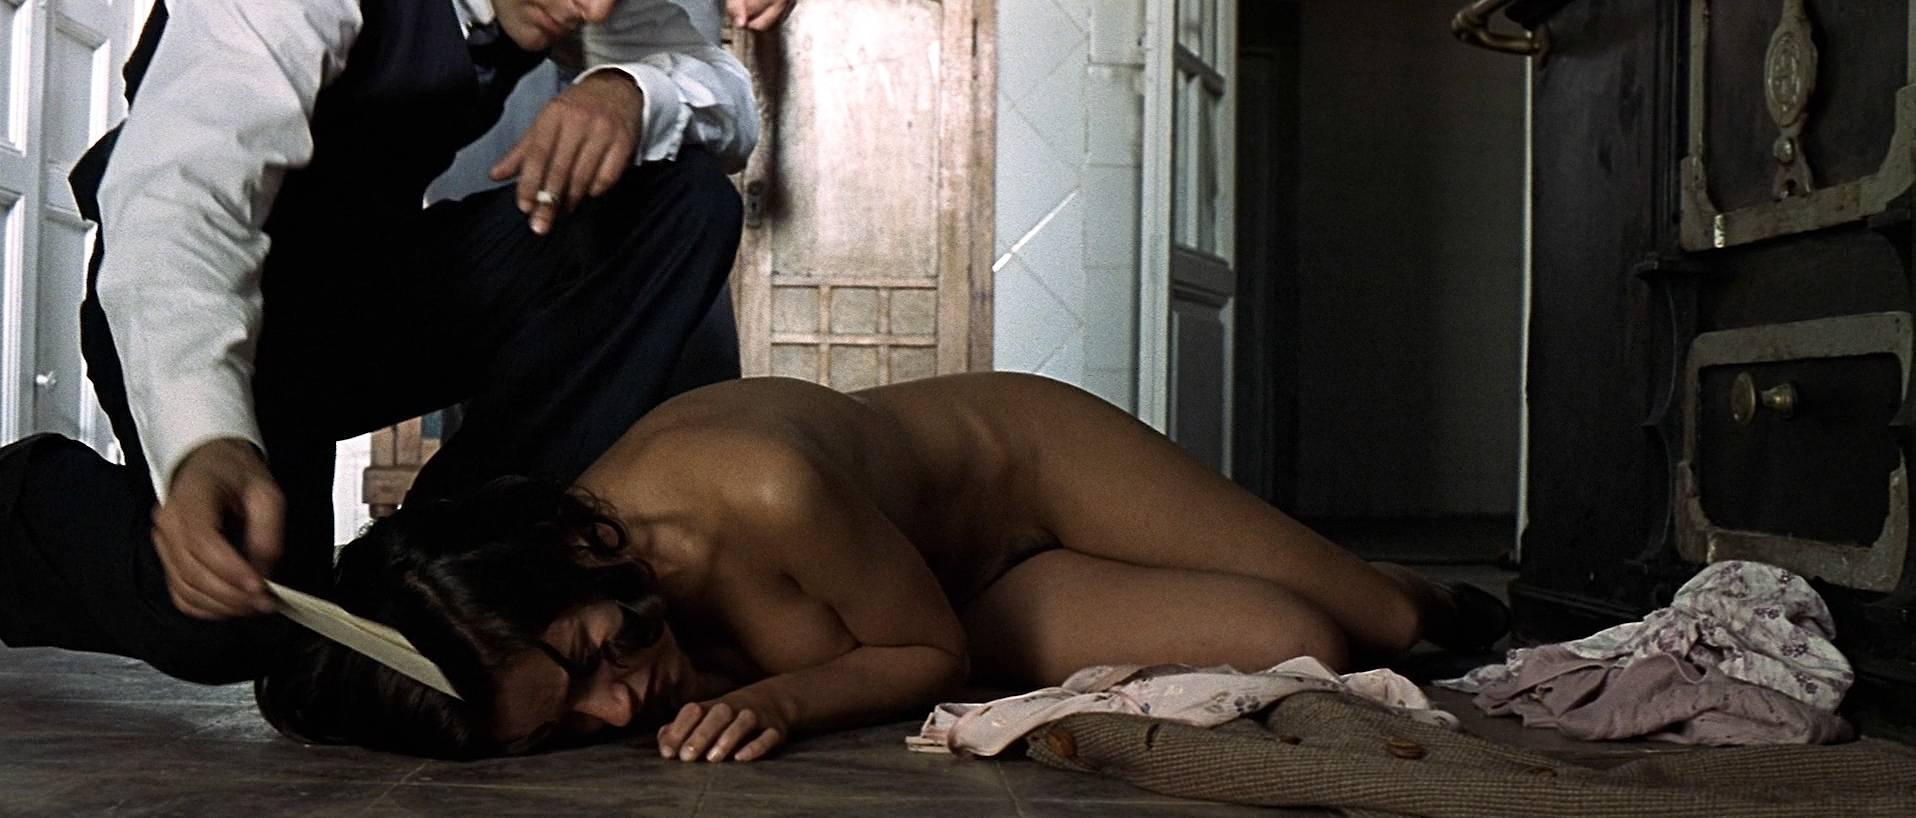 Verónica Sánchez nude topless and butt - Las 13 rosas (ES-2007) HD 1080p BluRay (2)